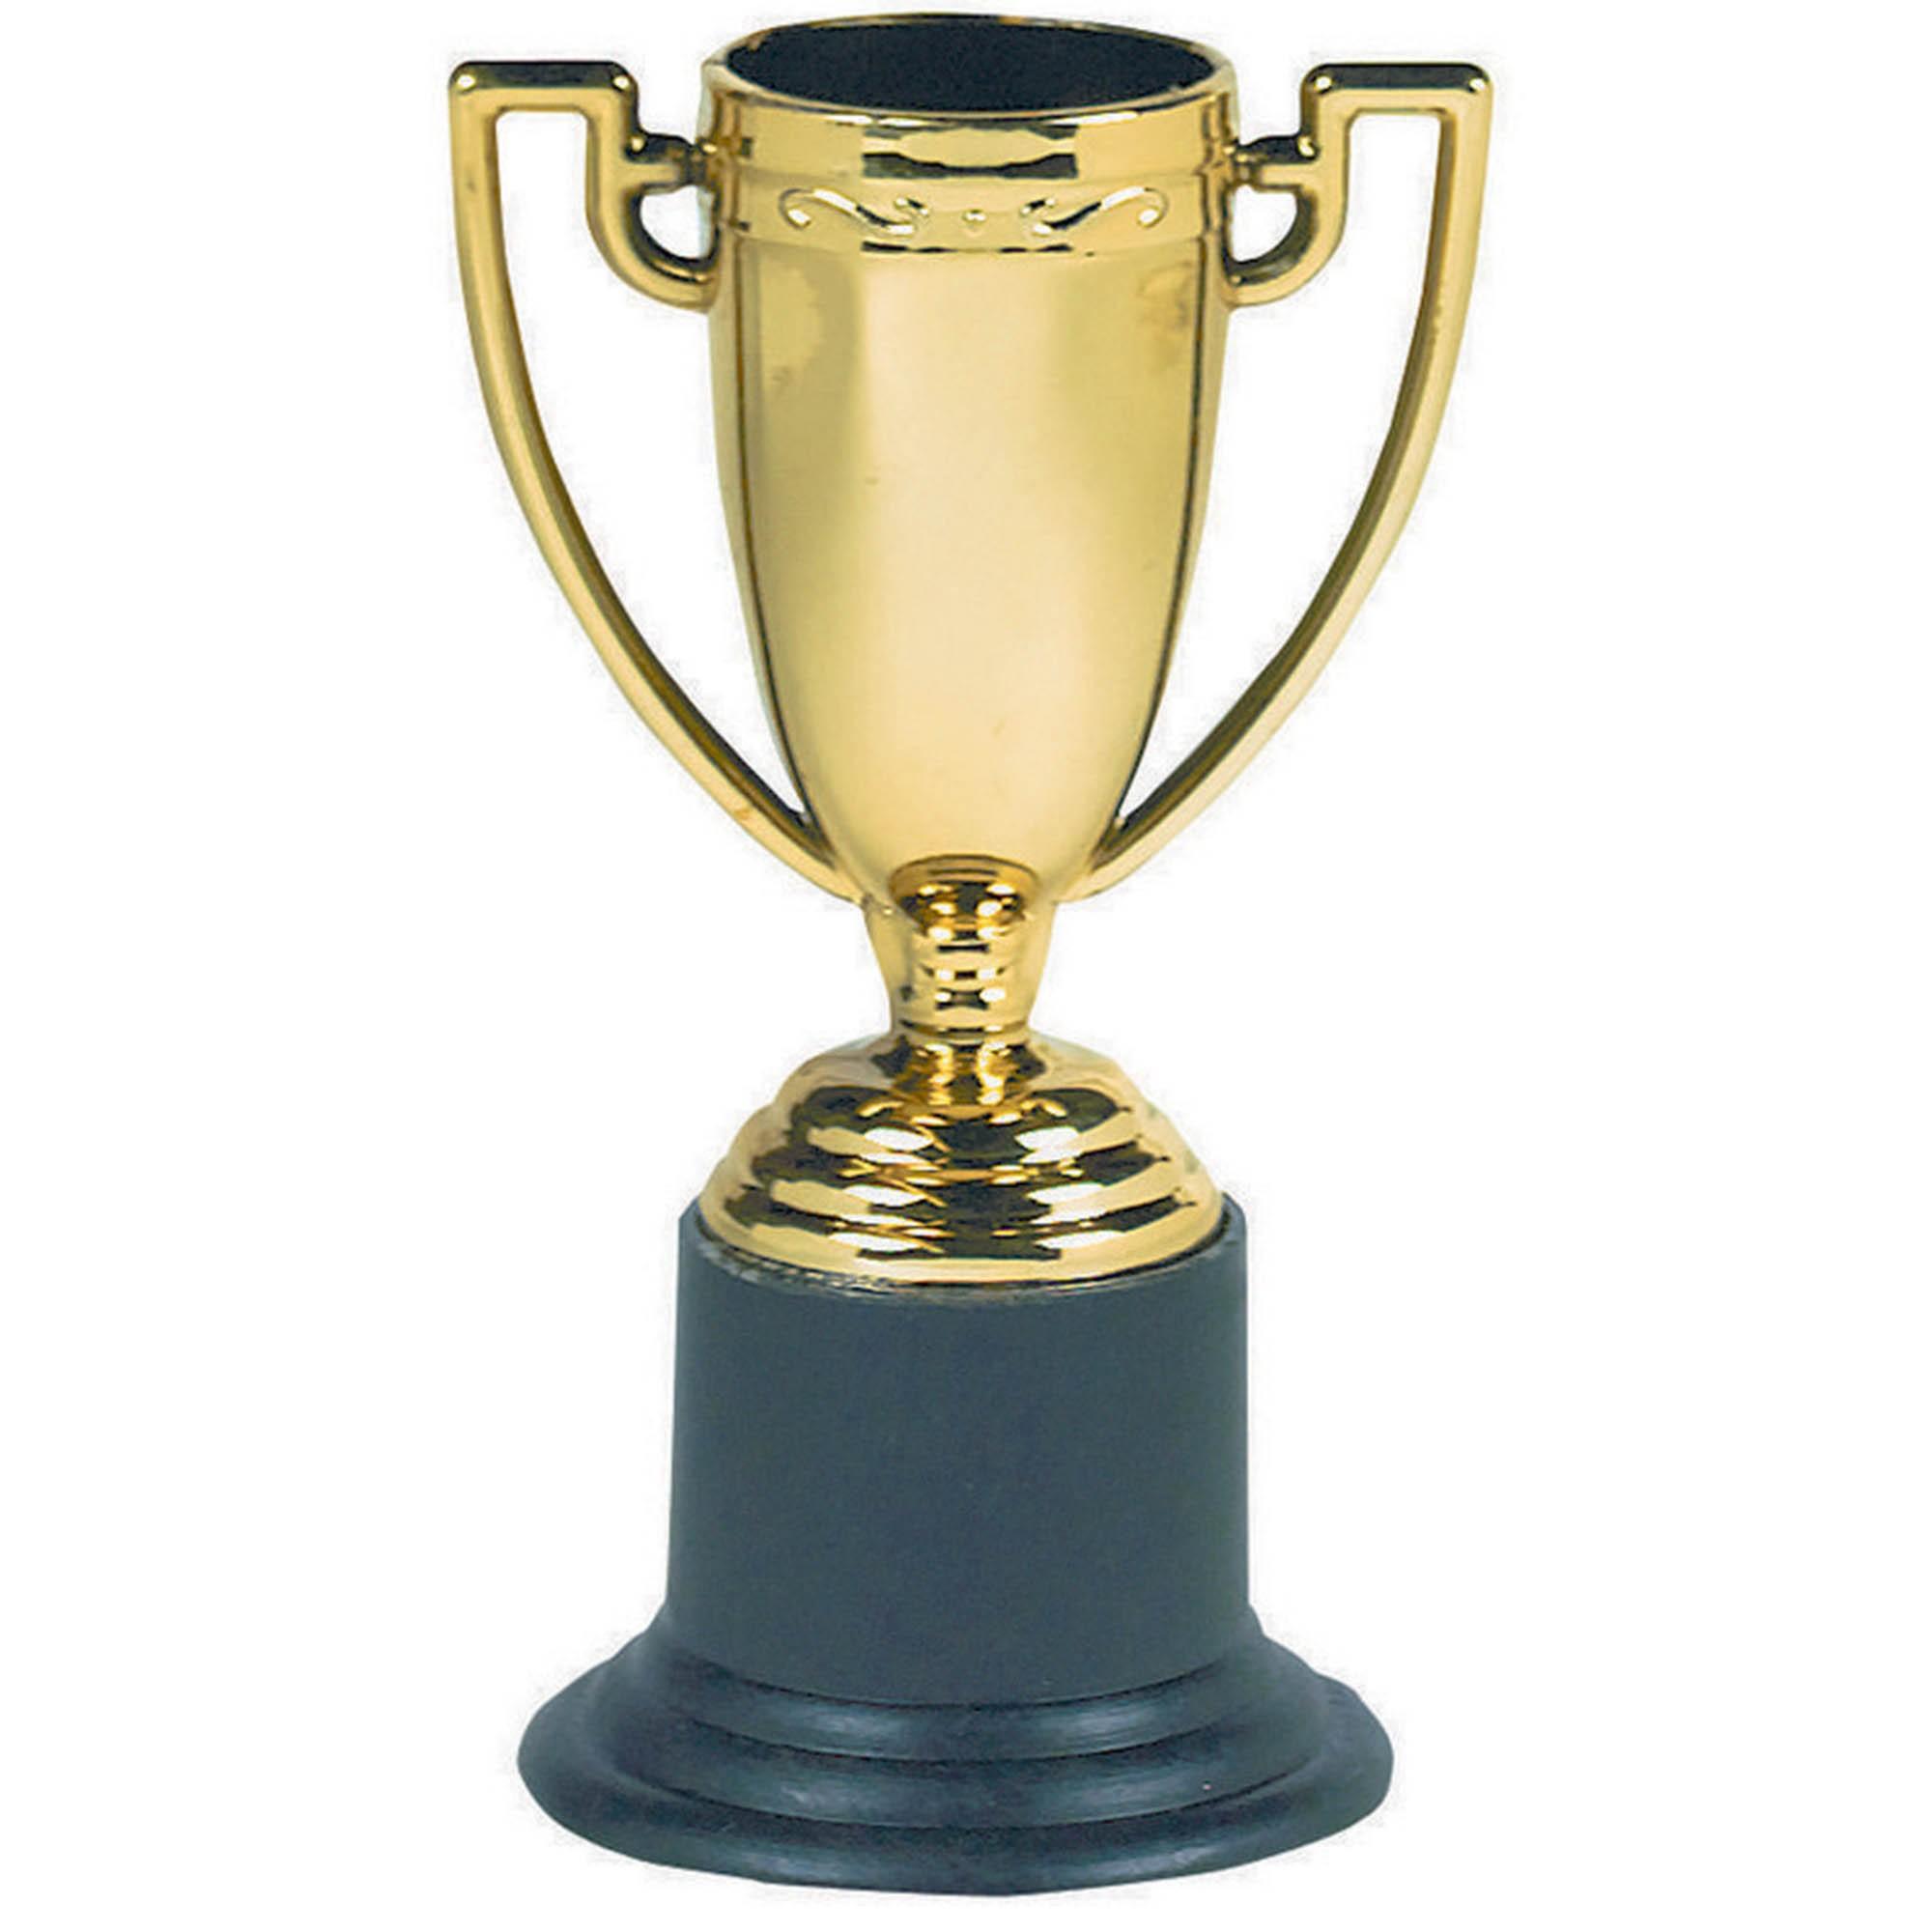 Sports Party Trophy Favor